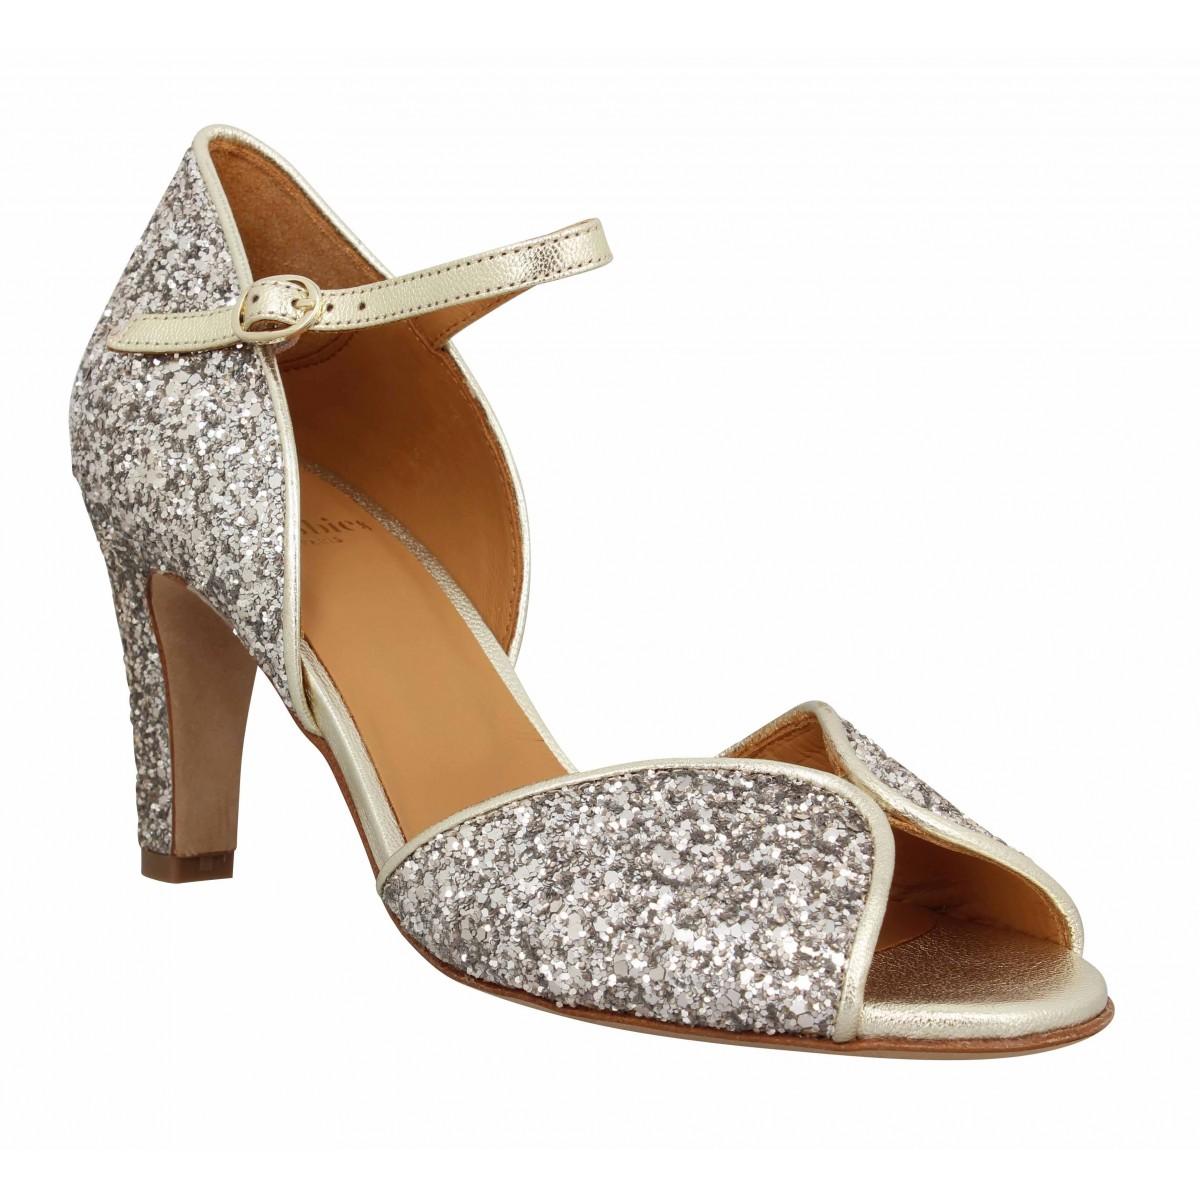 Sandales talons BOBBIES Holly glitter Femme Dore